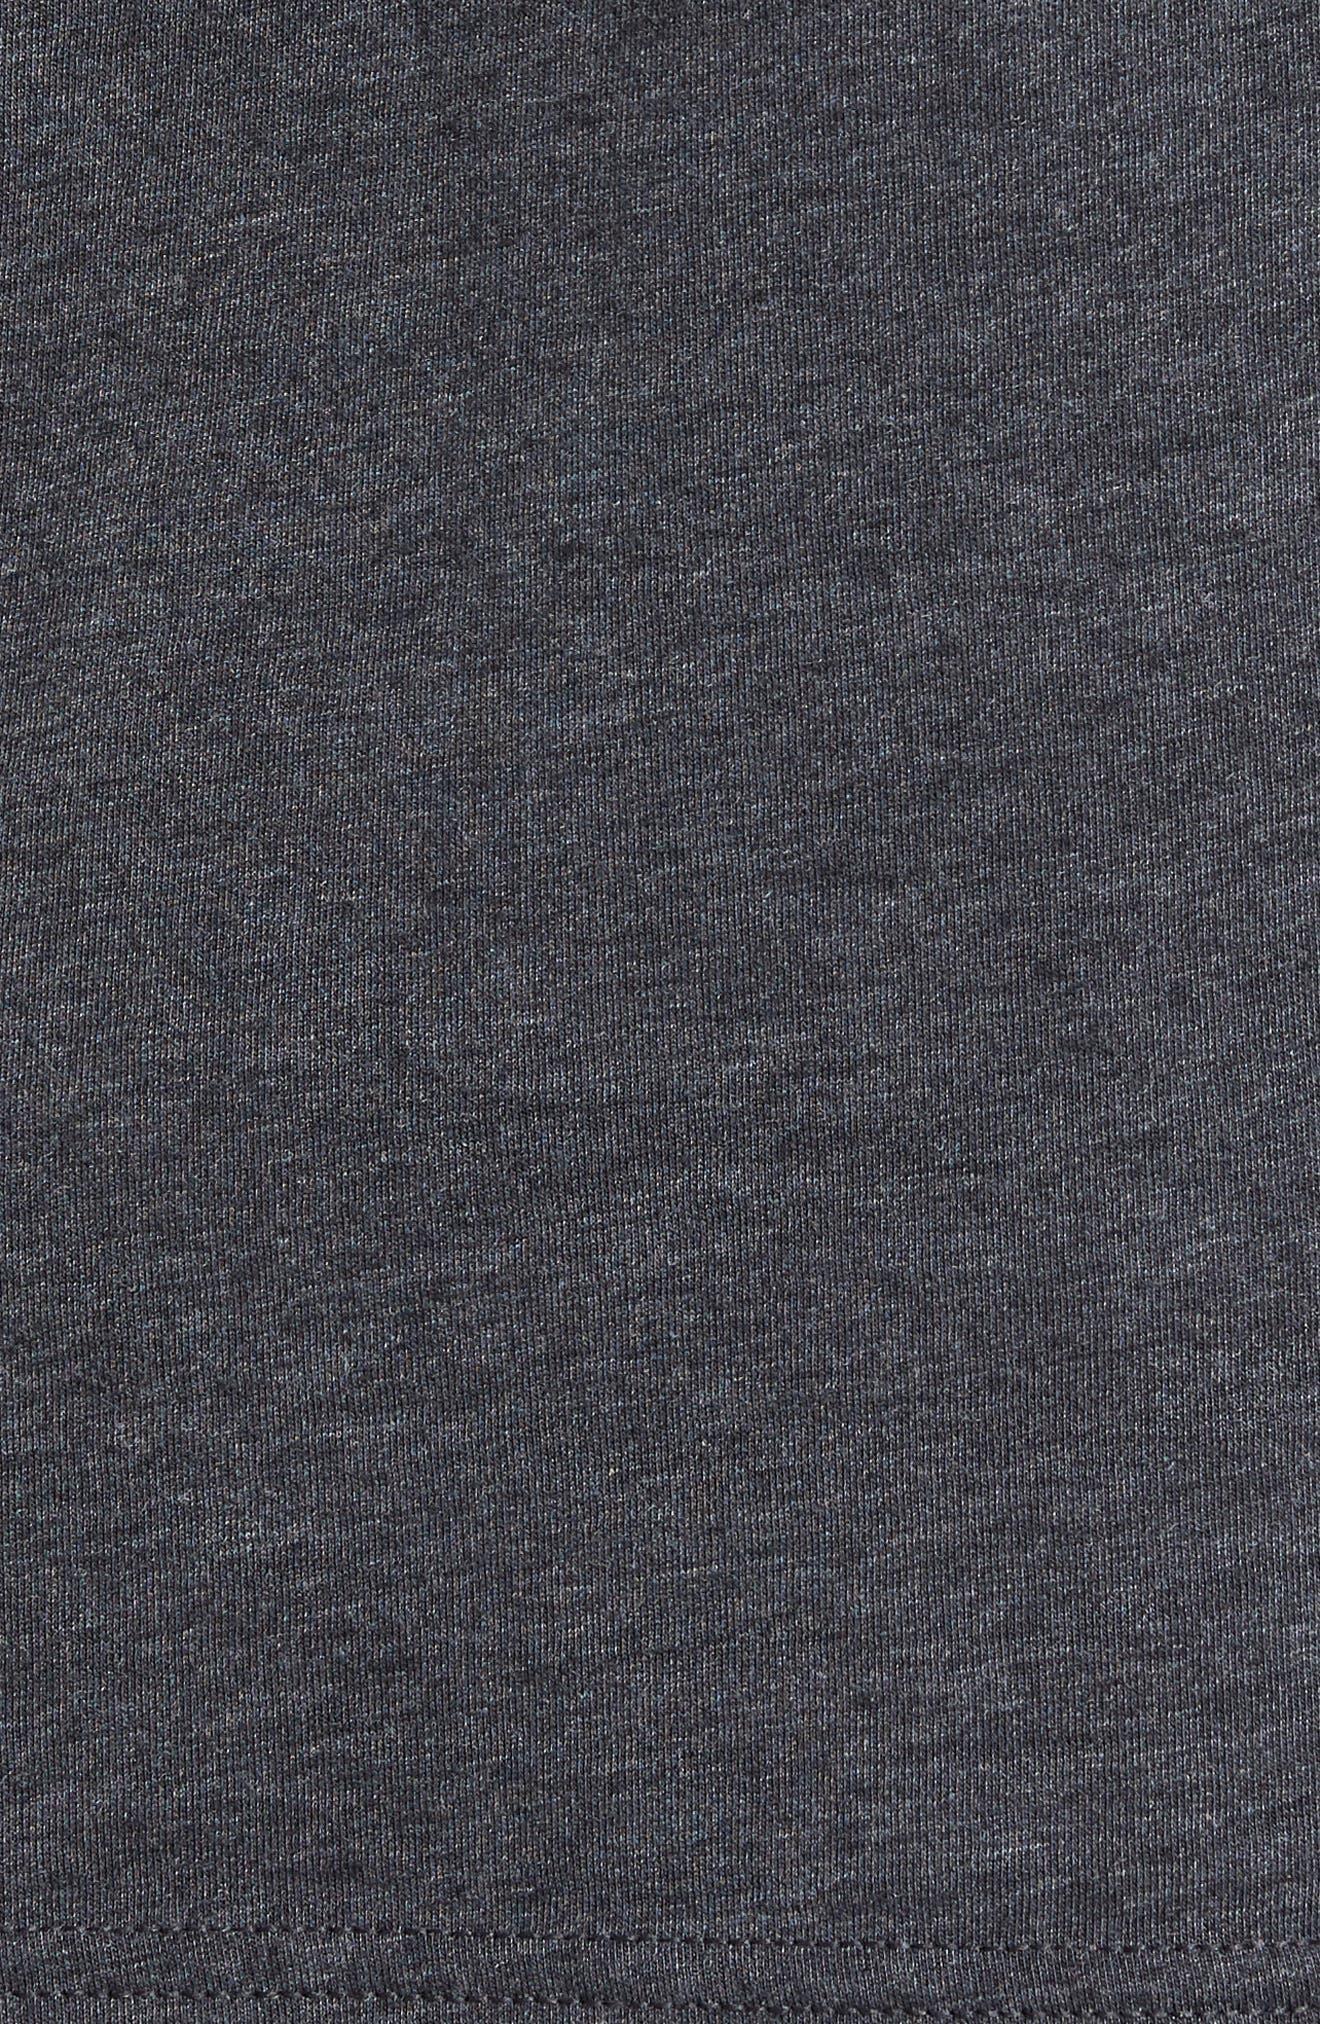 Portugal Jersey T-Shirt,                             Alternate thumbnail 5, color,                             020